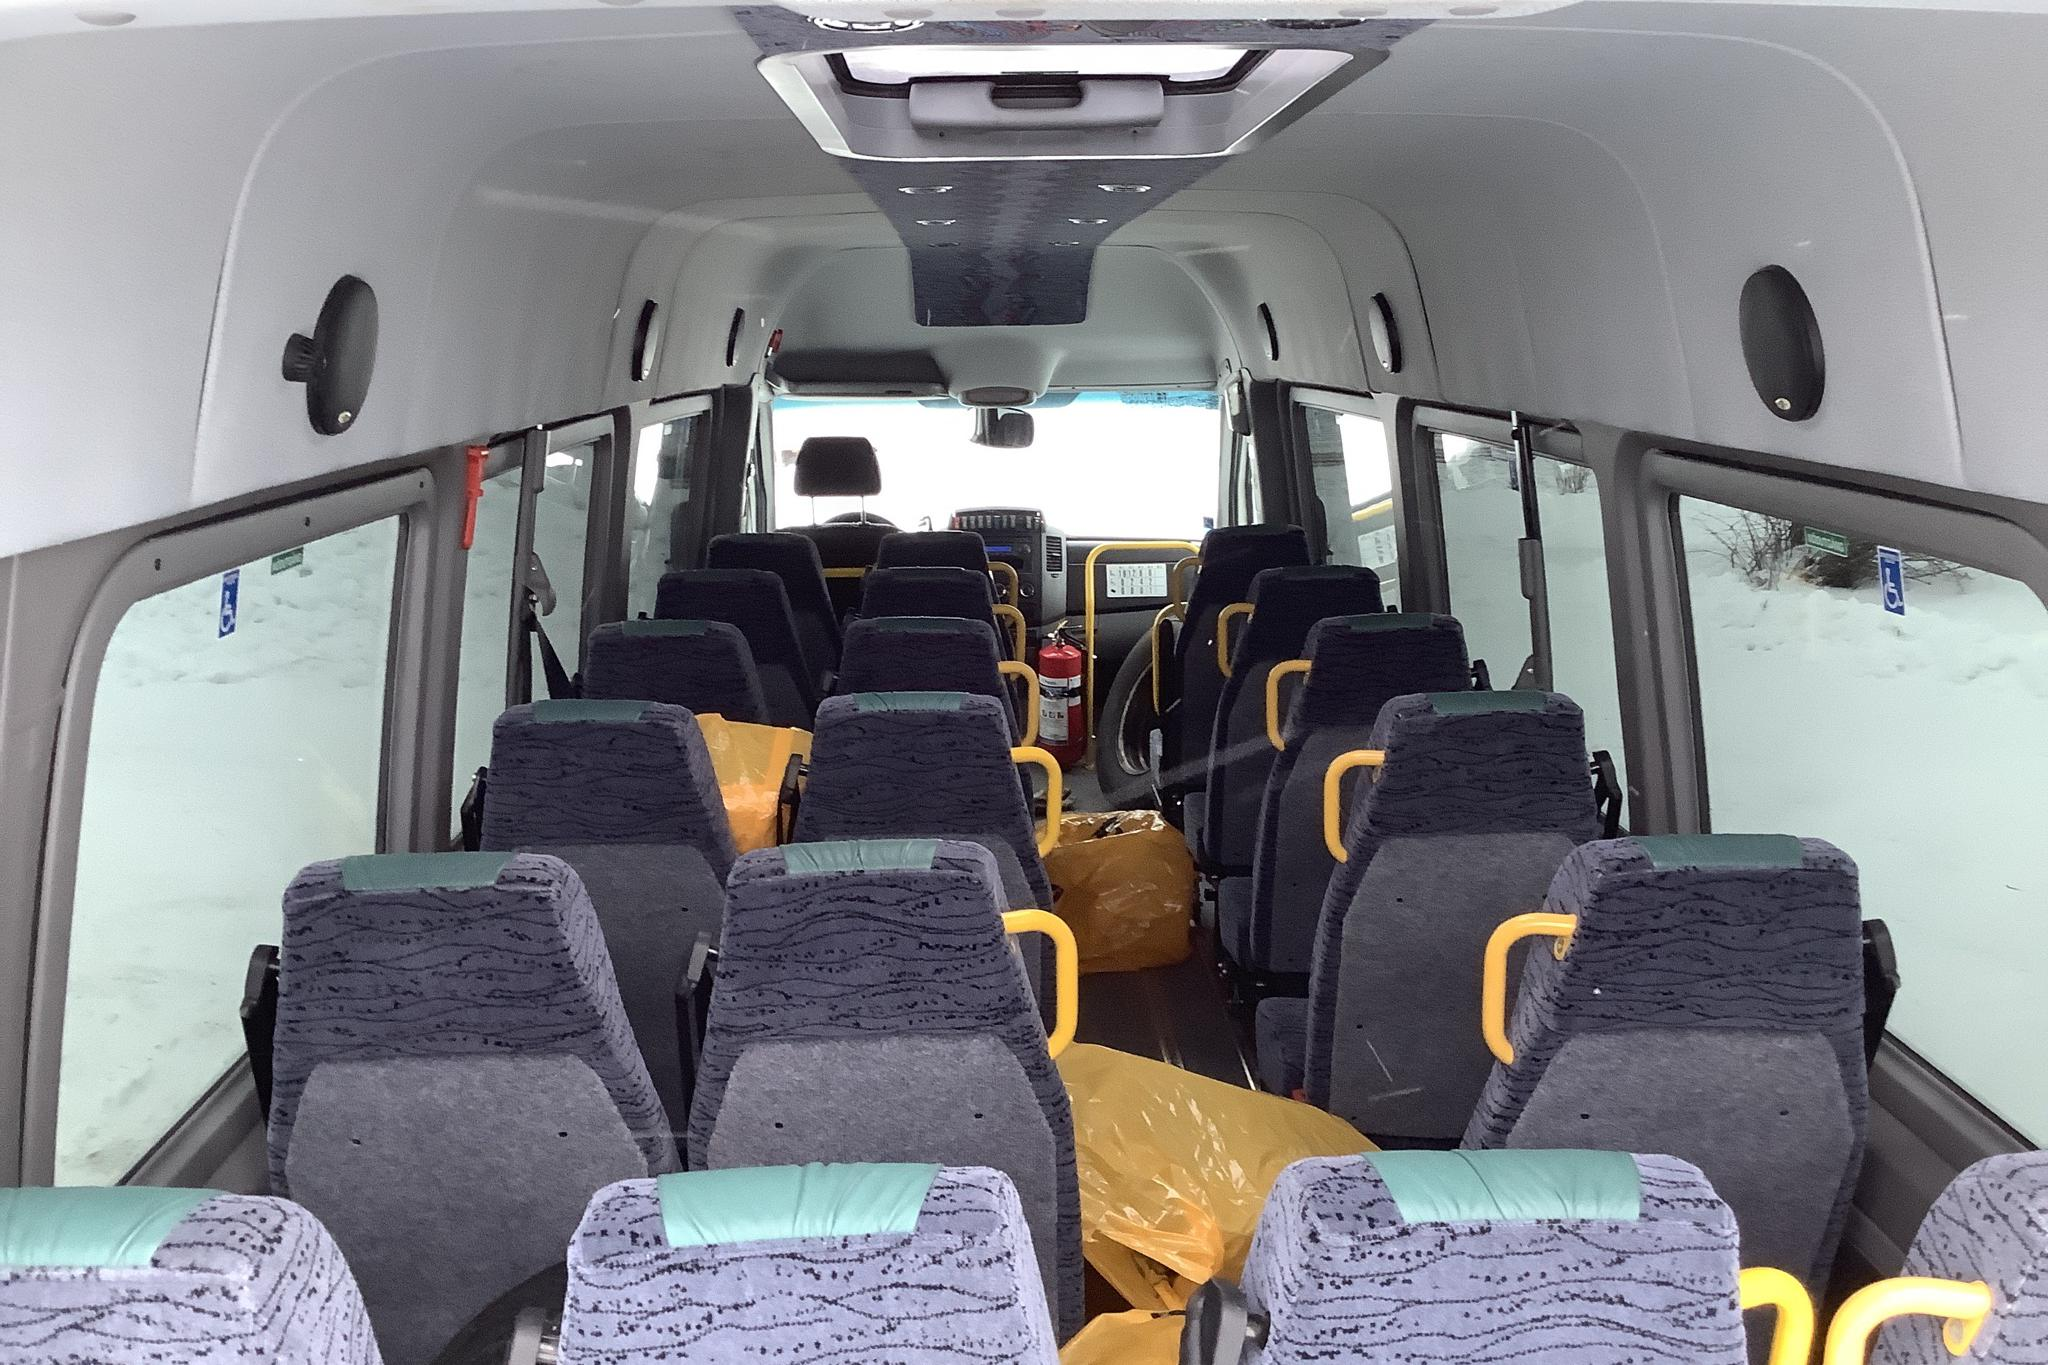 VW Crafter 50 2.0 TDI Buss (163hk) - 273 890 km - Manual - white - 2012